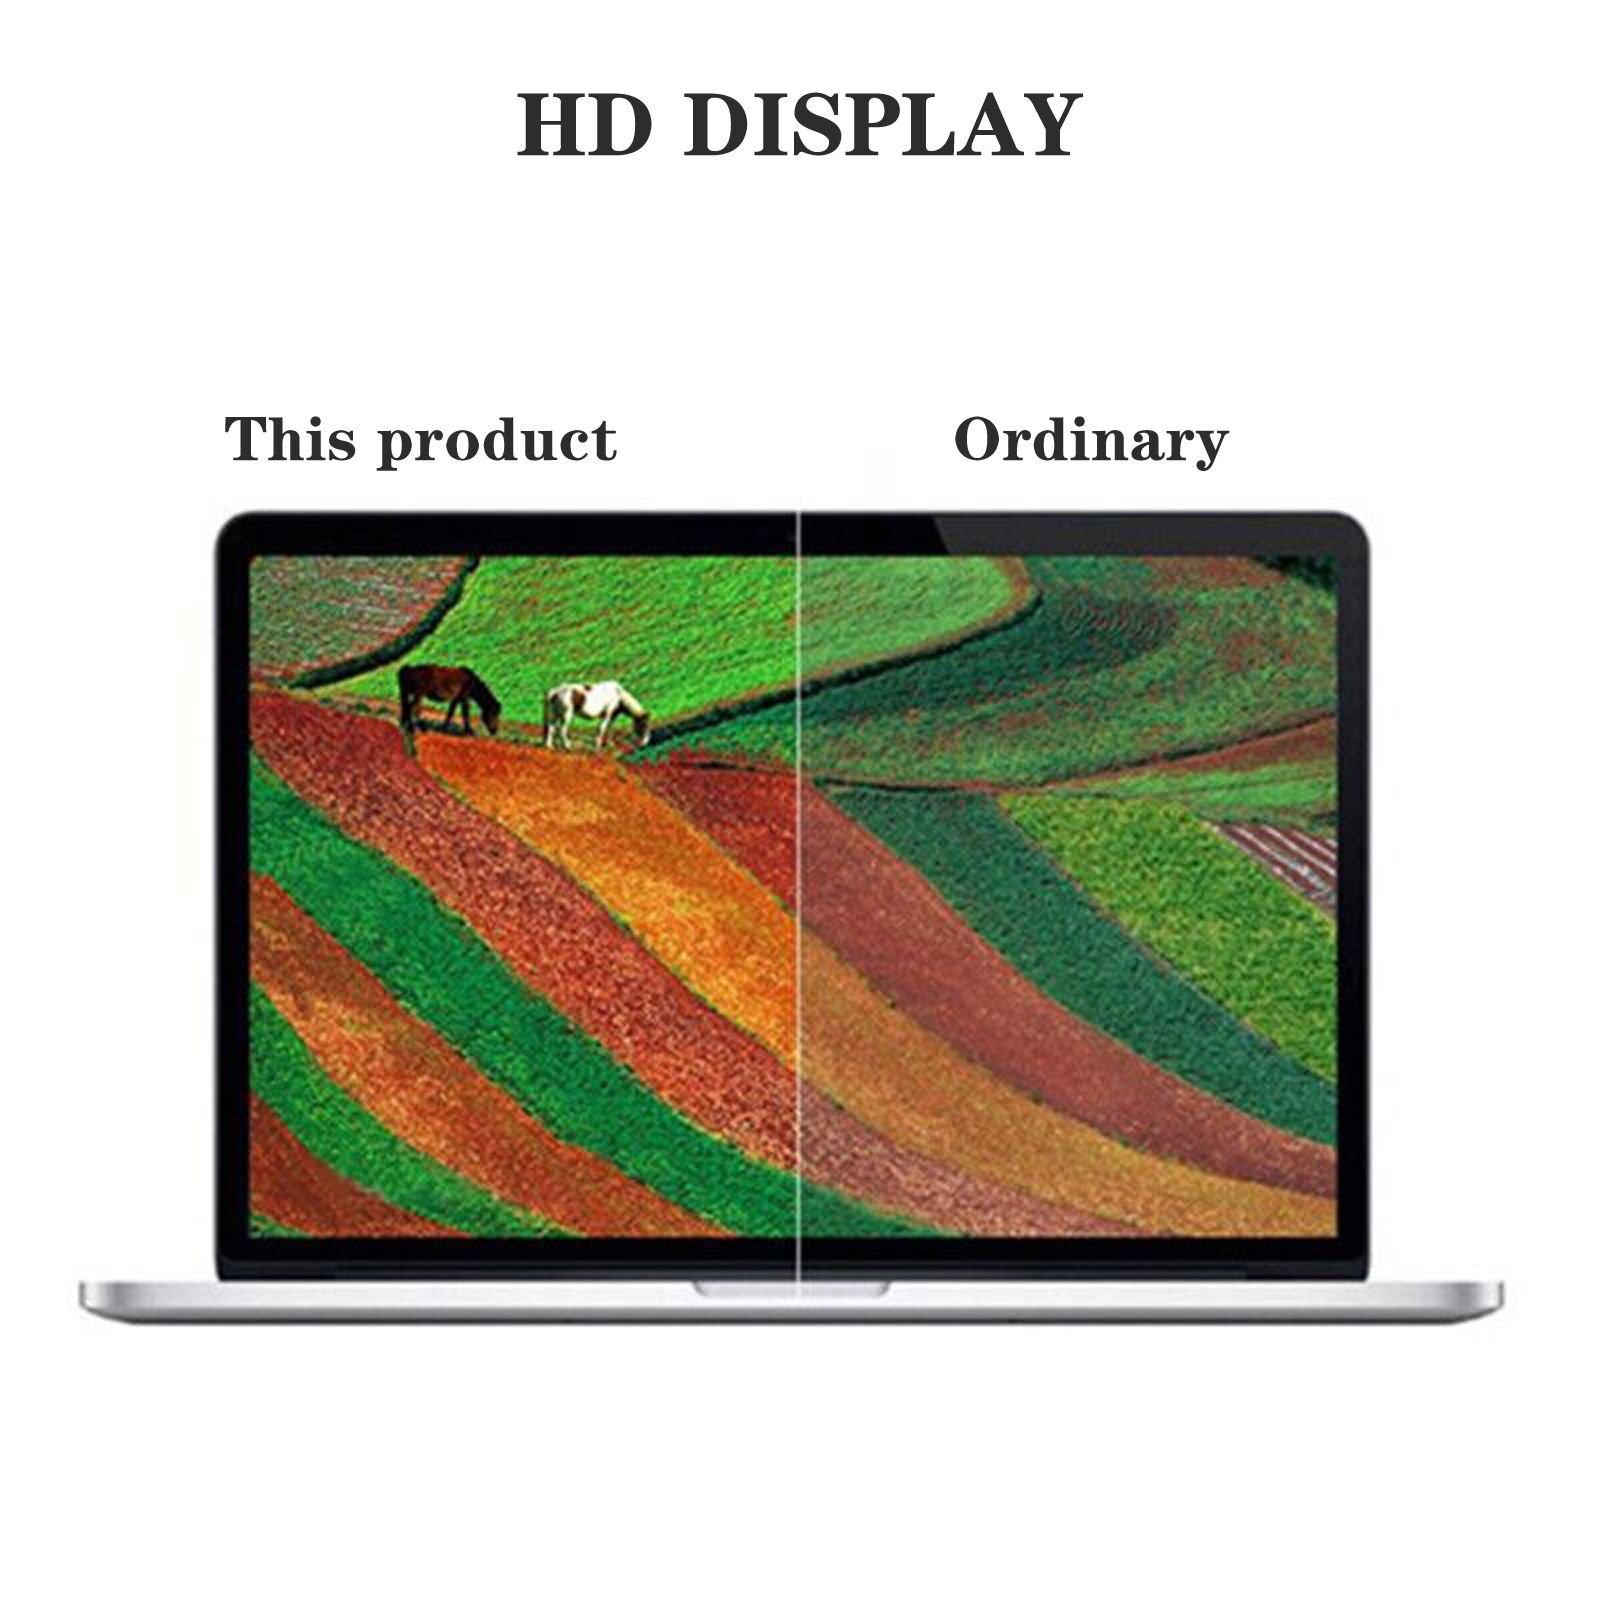 Lenovo 500e Chromebook Screen Protector,HD Clear LCD Anti-Scratch Anti-Fingerprints Guard Film For 11.6'' Lenovo 500e Chromebook 2-in-1 Laptop(2-pack) by Liudashun (Image #5)